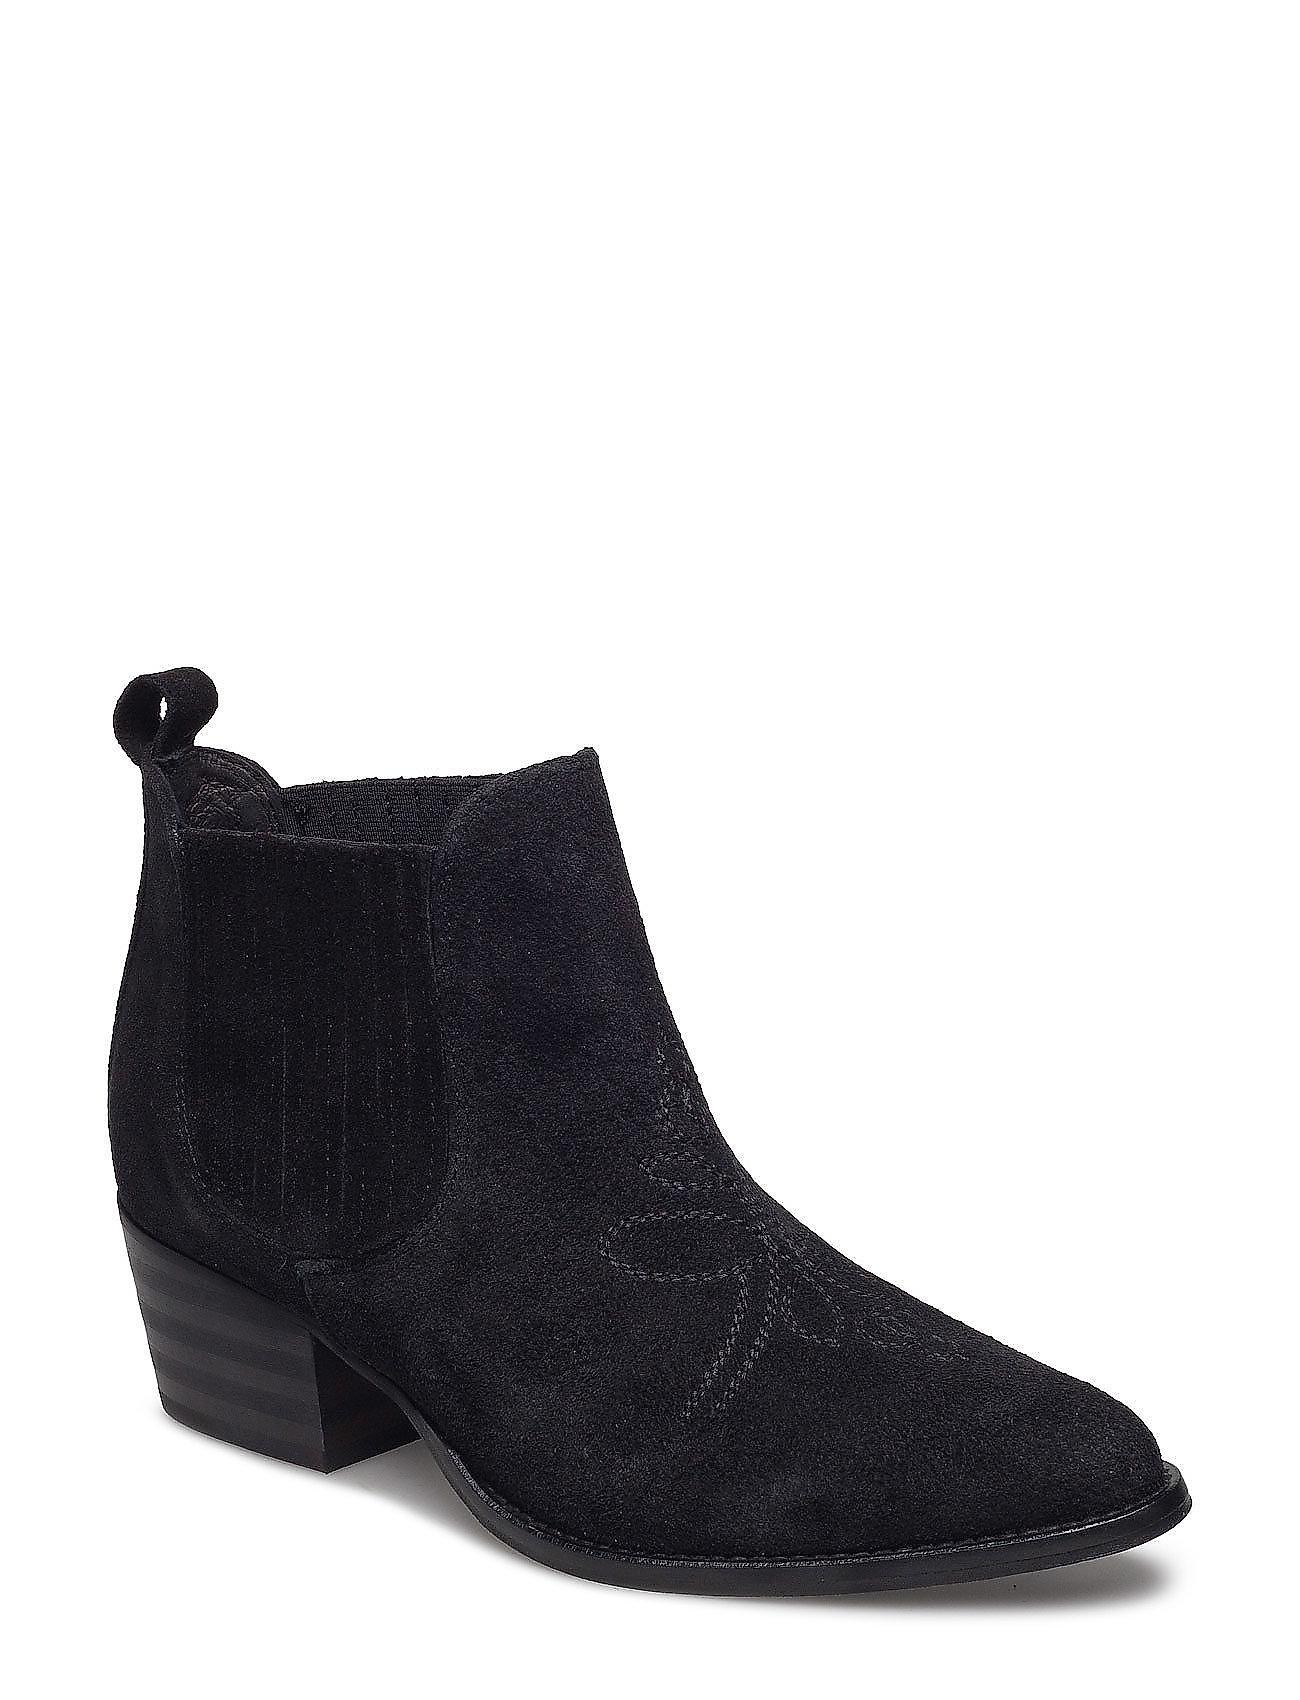 Shoe The Bear LEILA S - BLACK